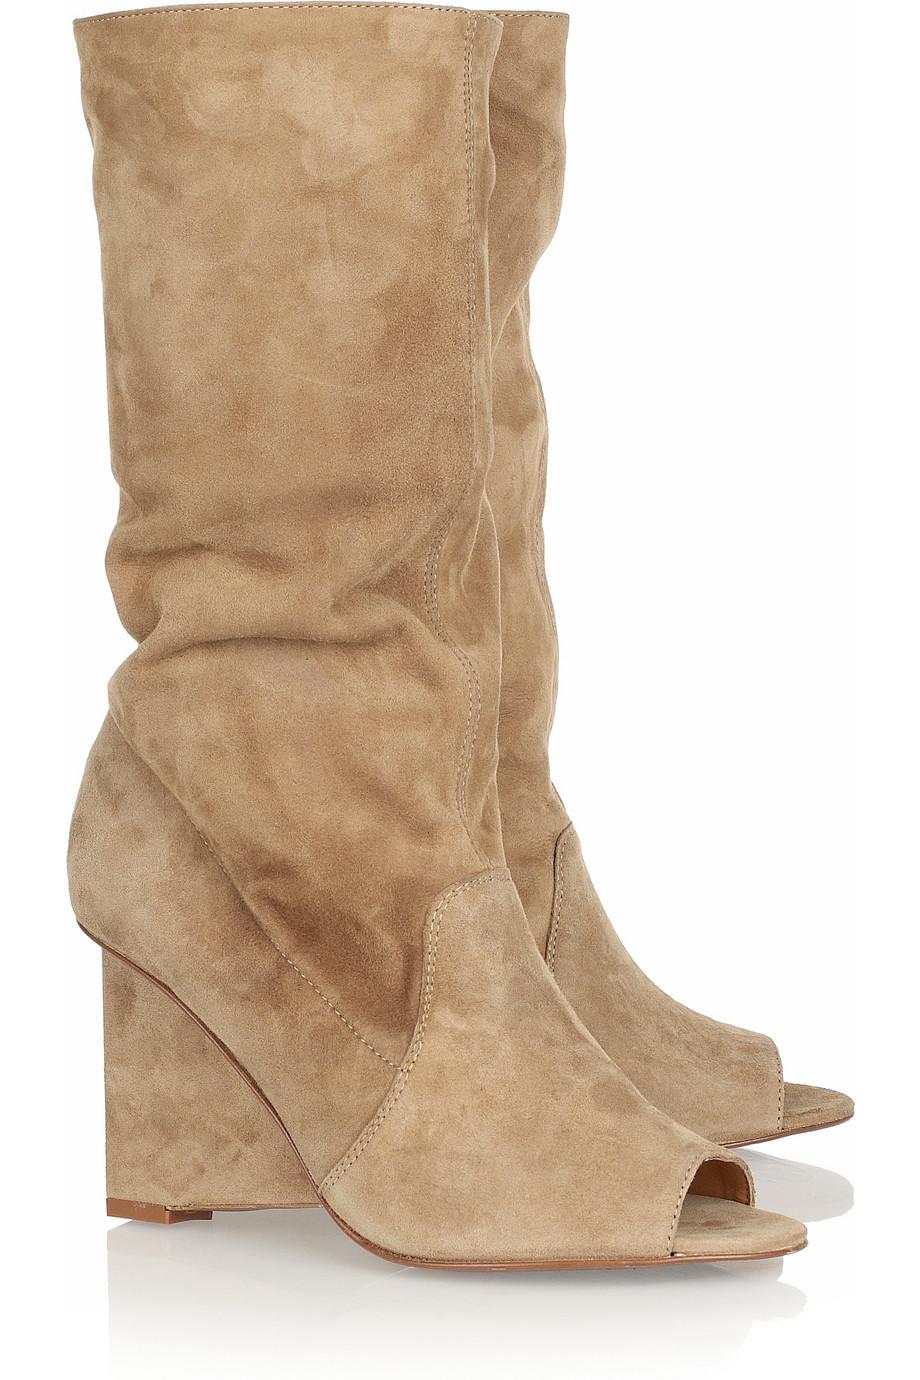 diane furstenberg weaver suede opentoe boots in beige